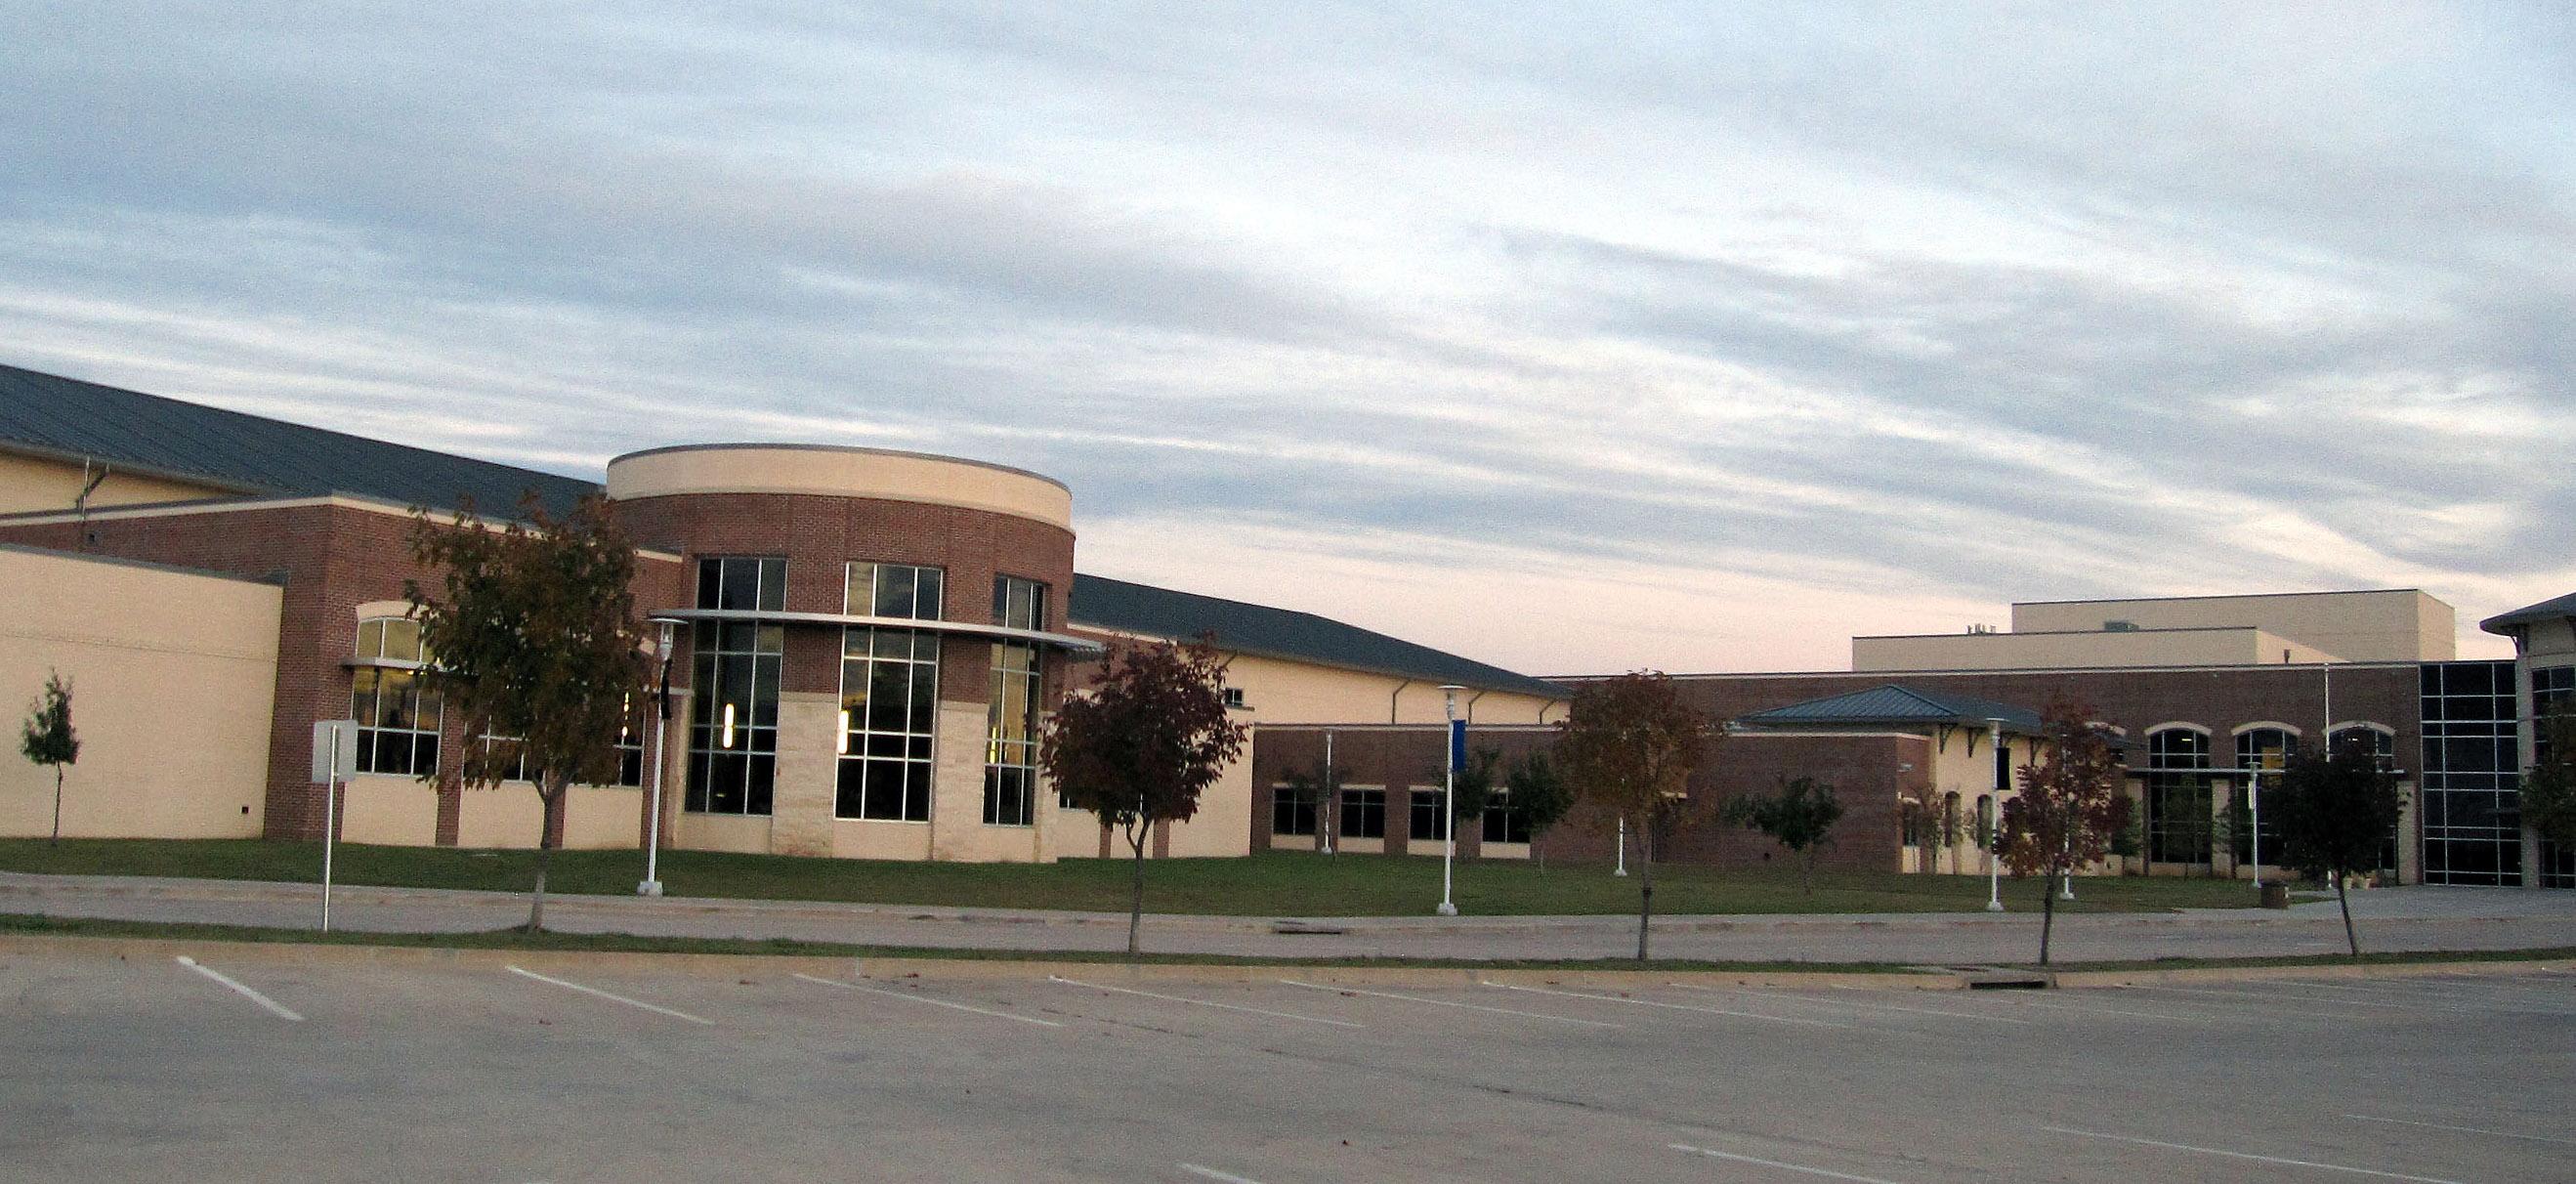 ... Photo taken at Guyer High School by John C. on 10/16/2015 ...